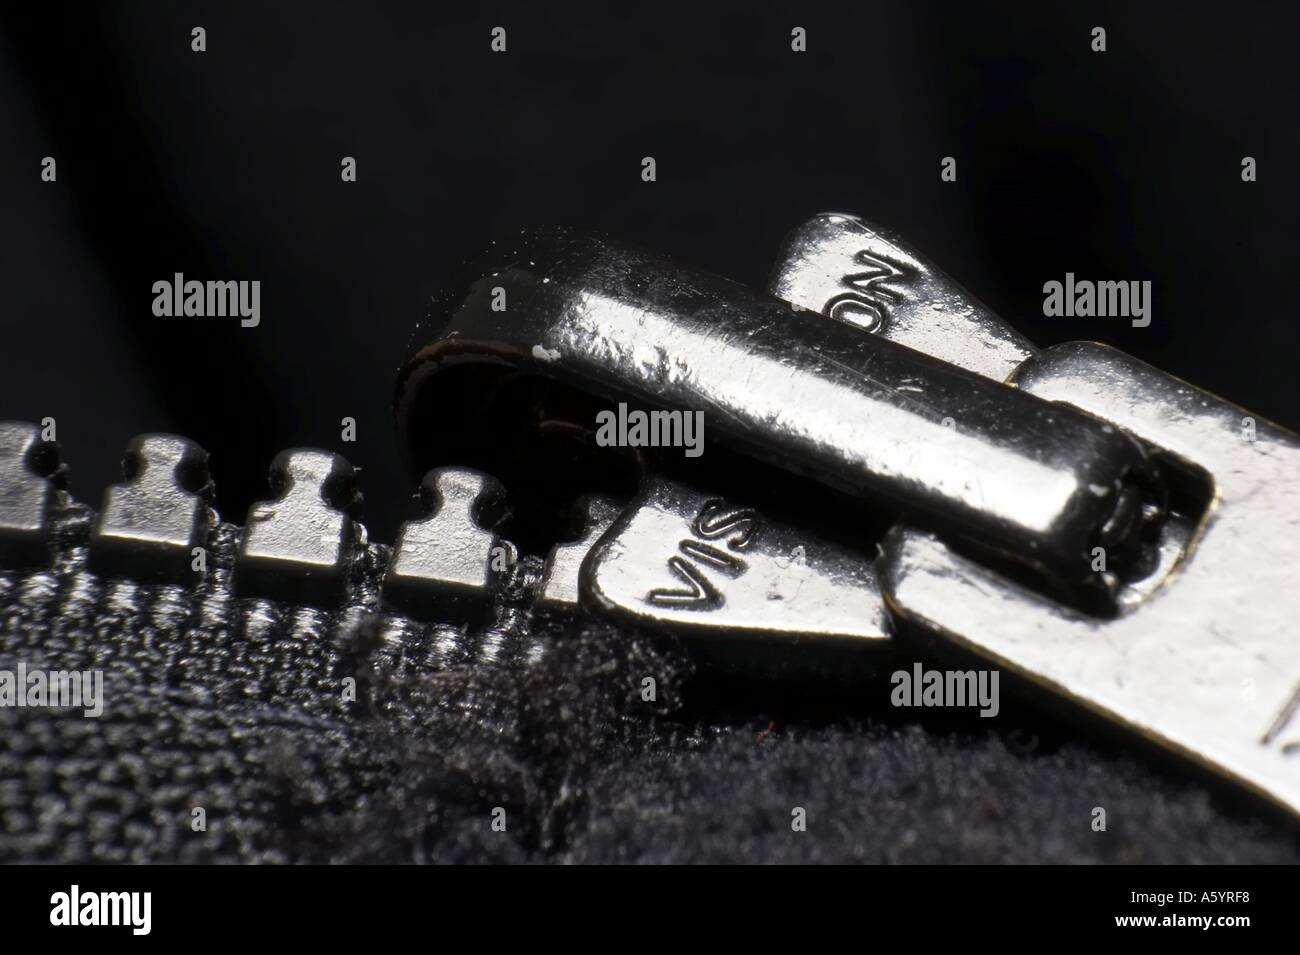 details of zipper - Stock Image